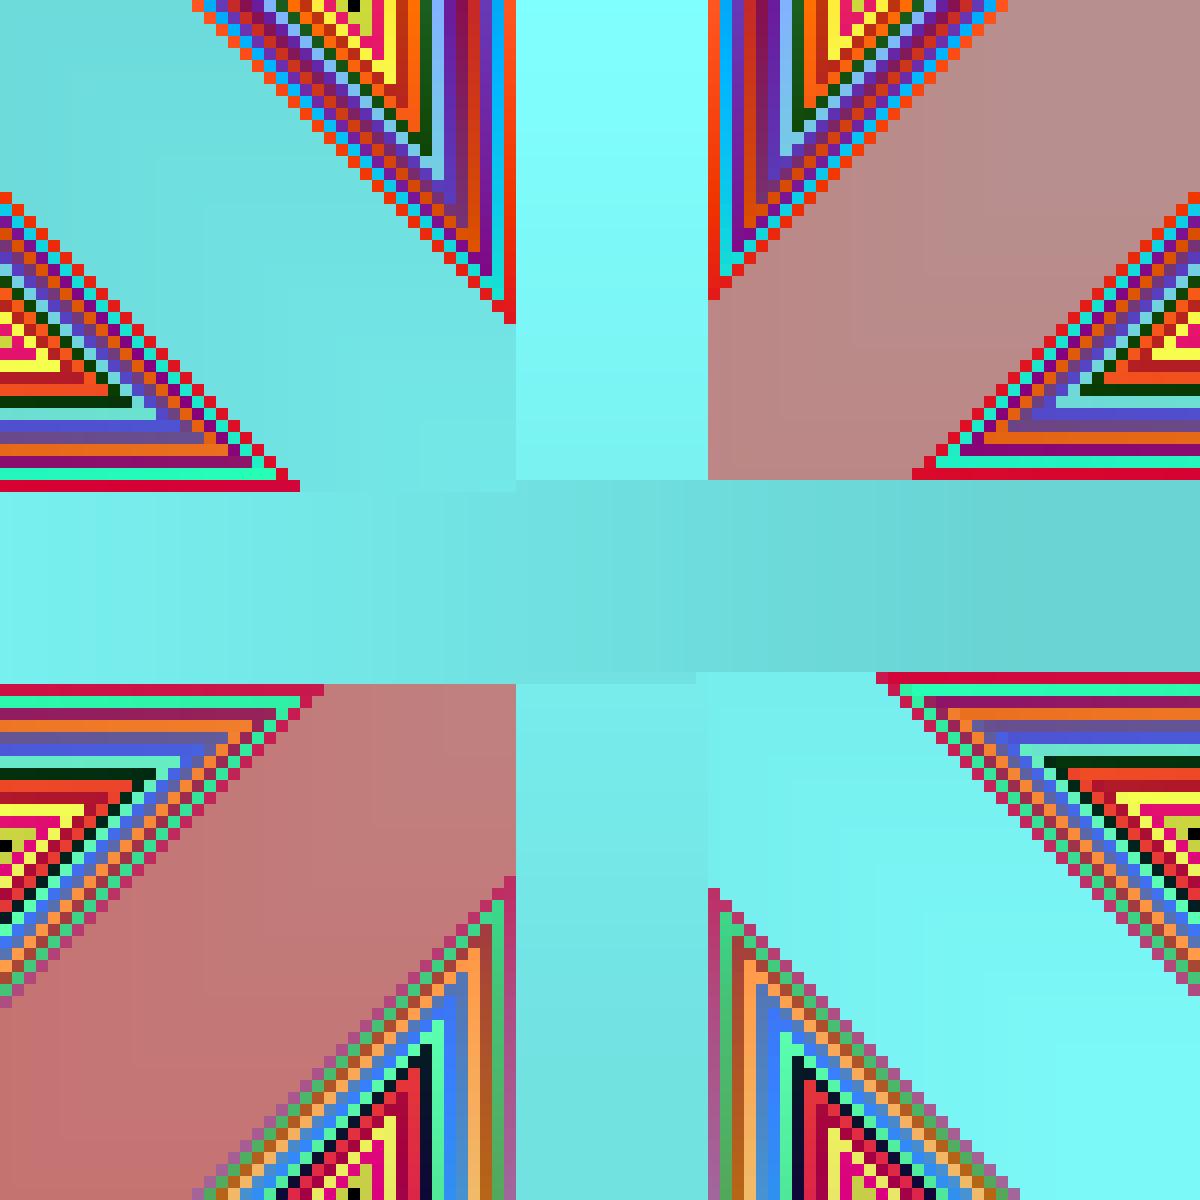 main-image-colors   by urmumgae123